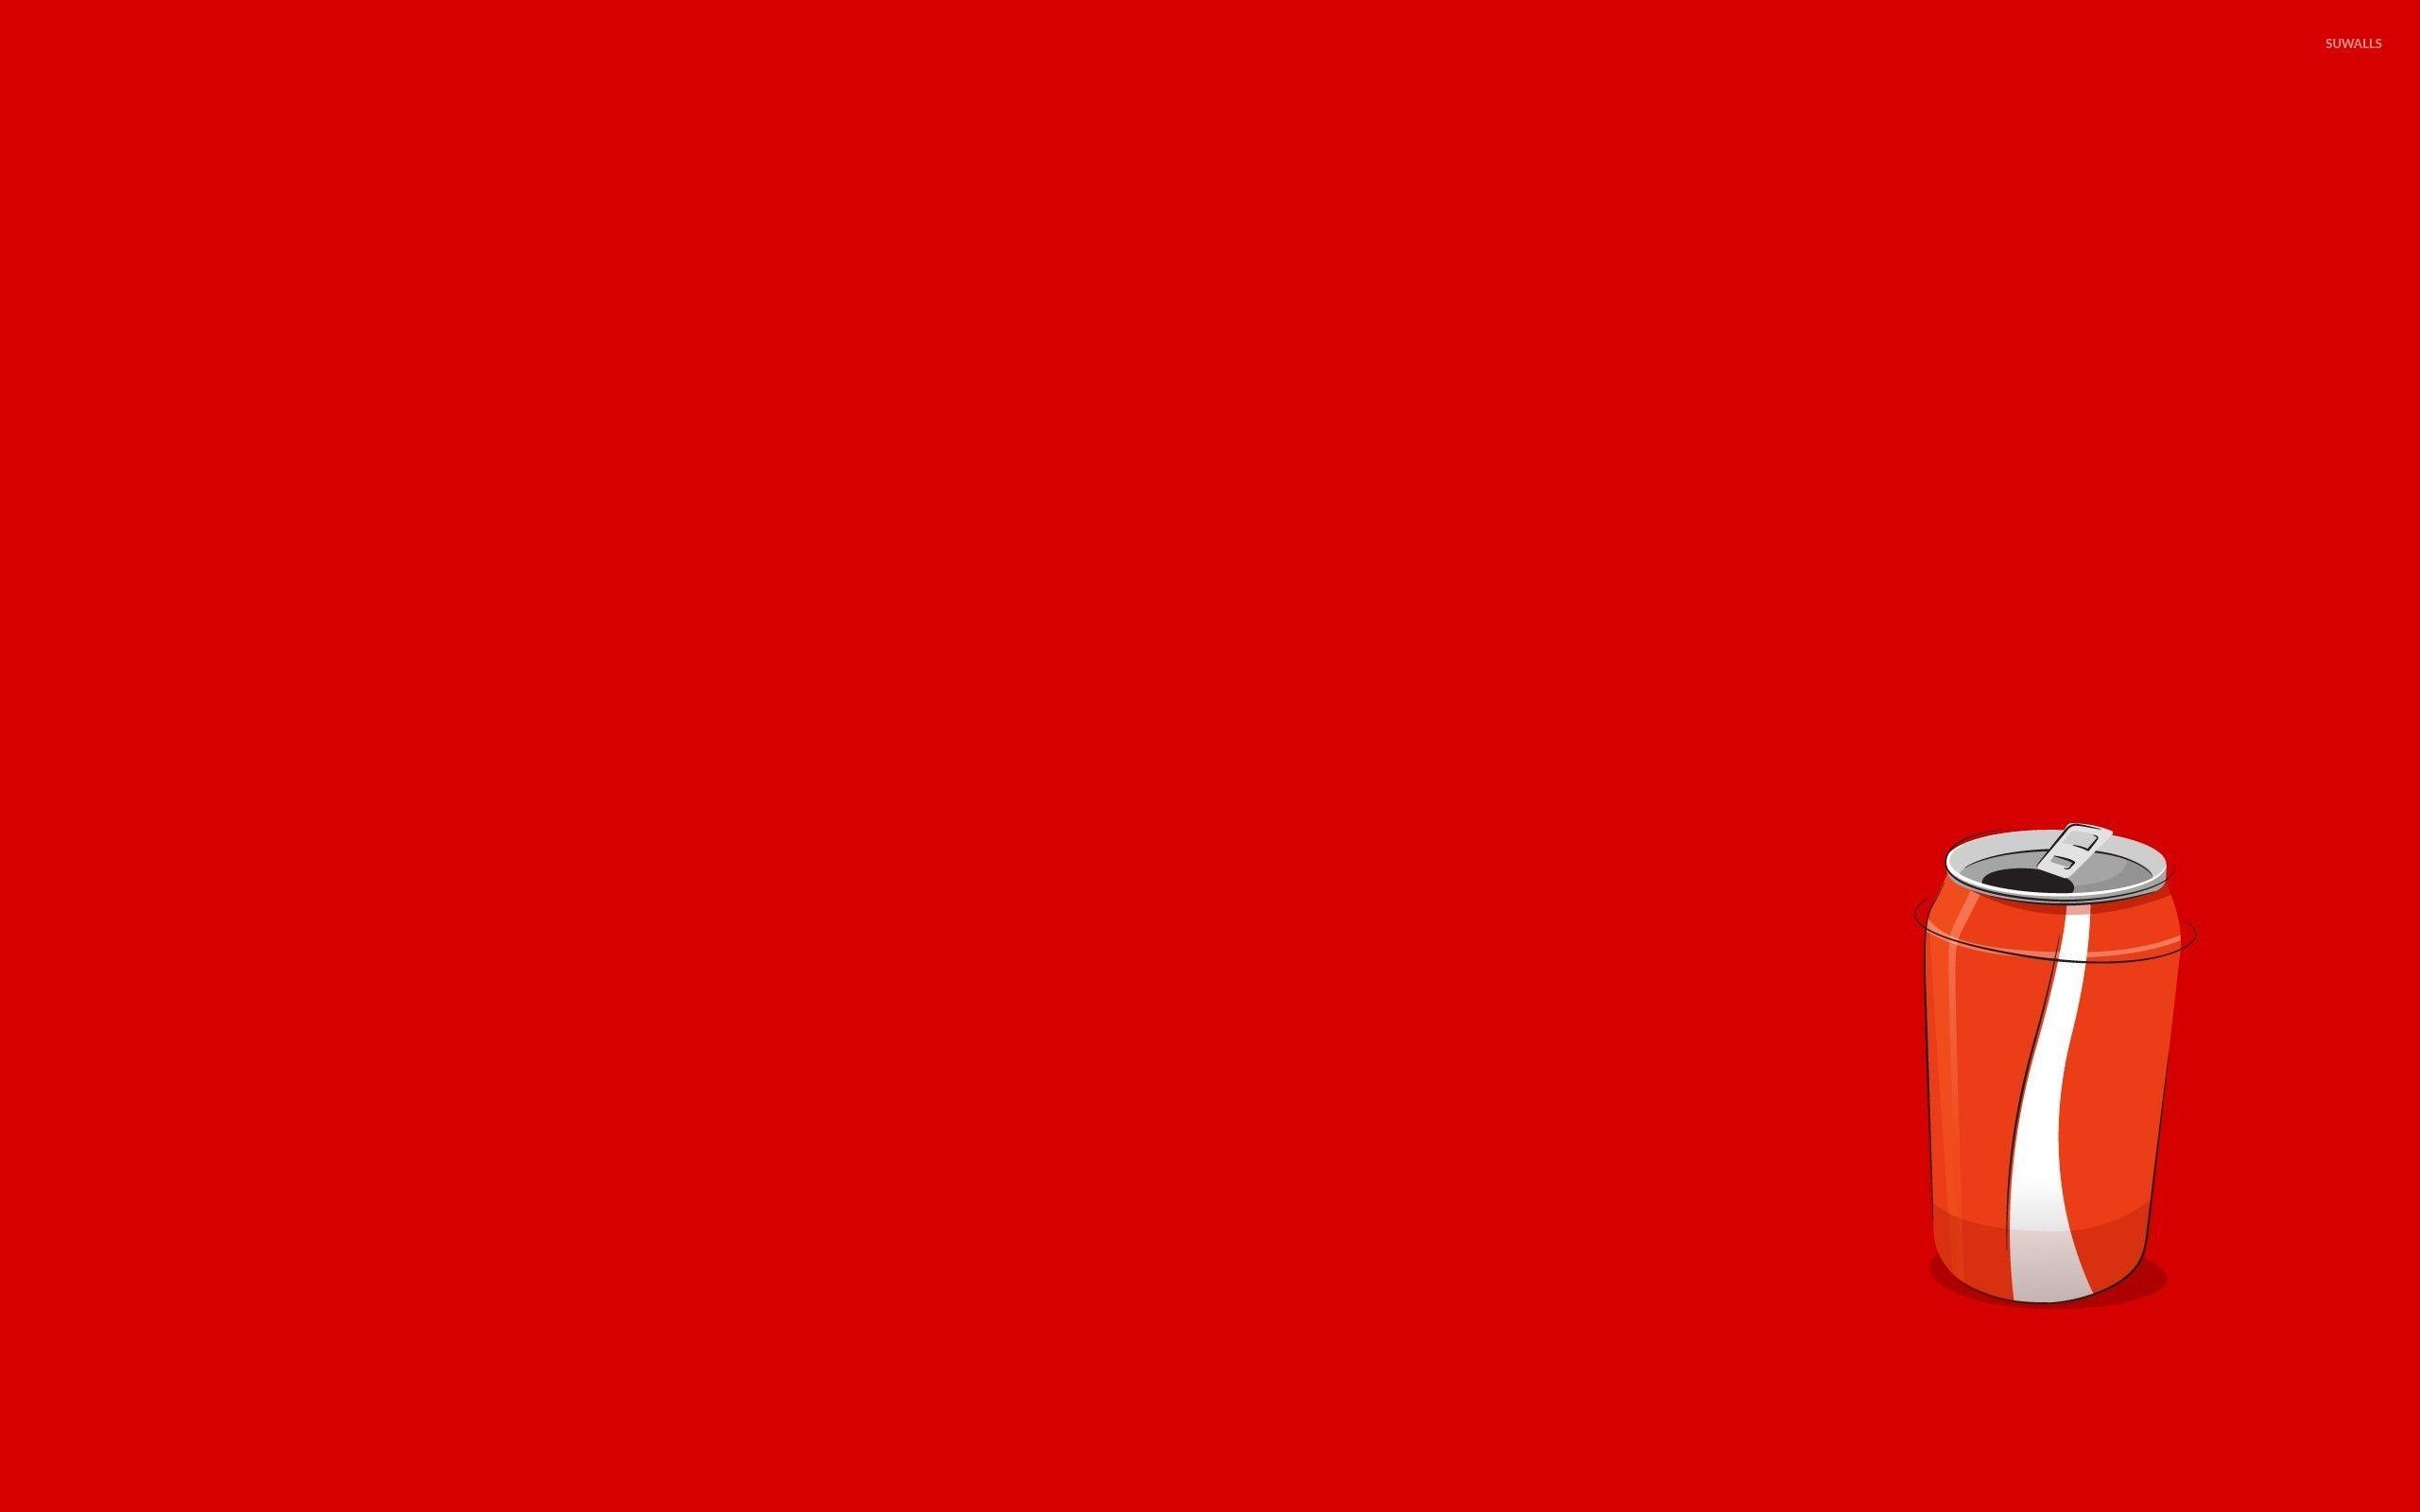 Soda can wallpaper - Minimalistic wallpapers - #44757